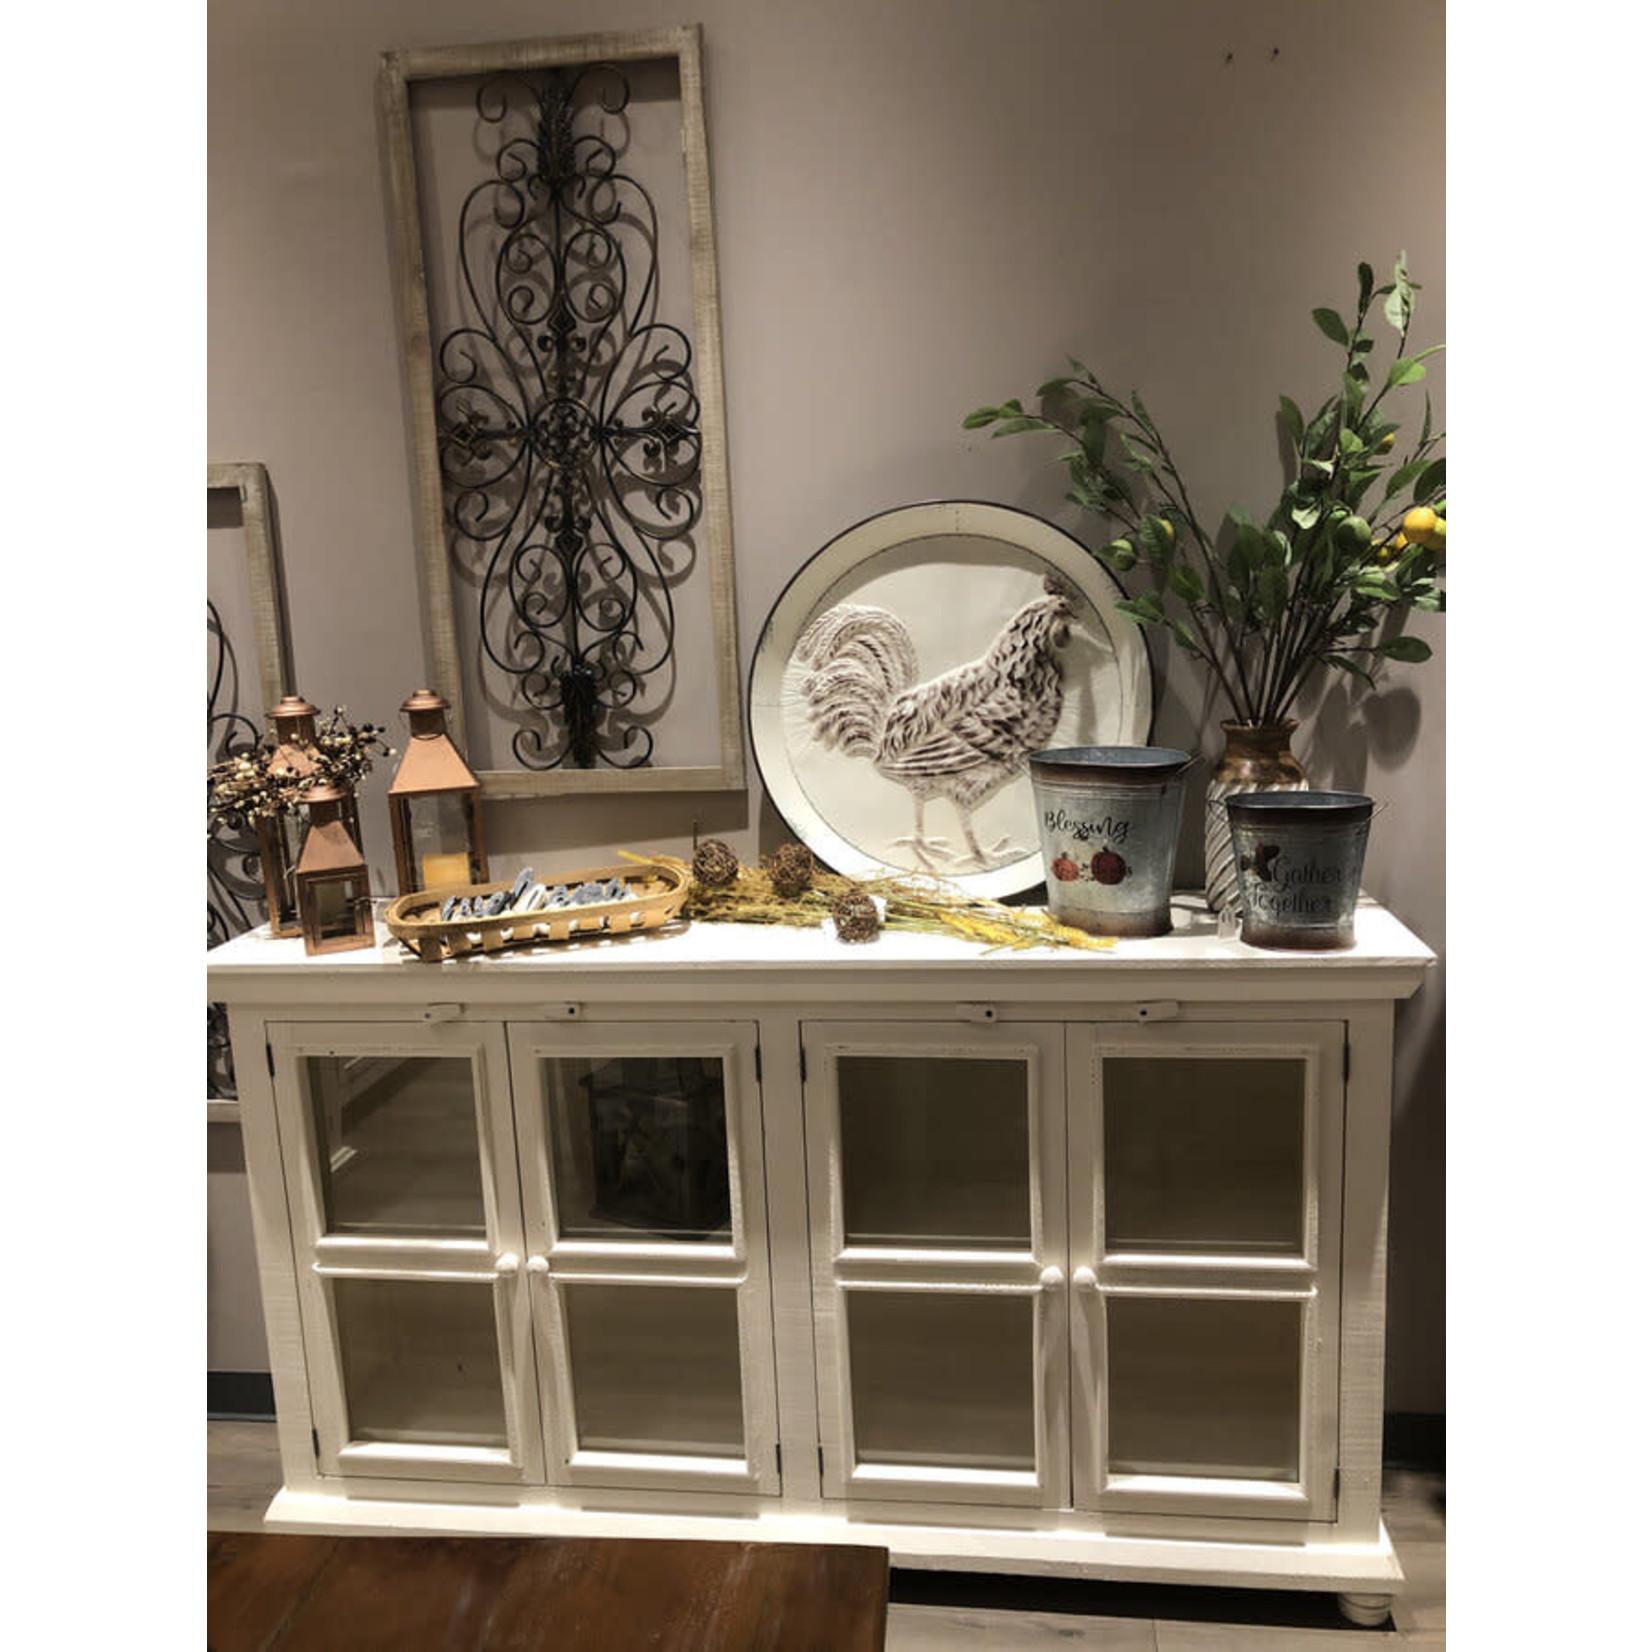 Cabinet 4 Door W/Glass (White)